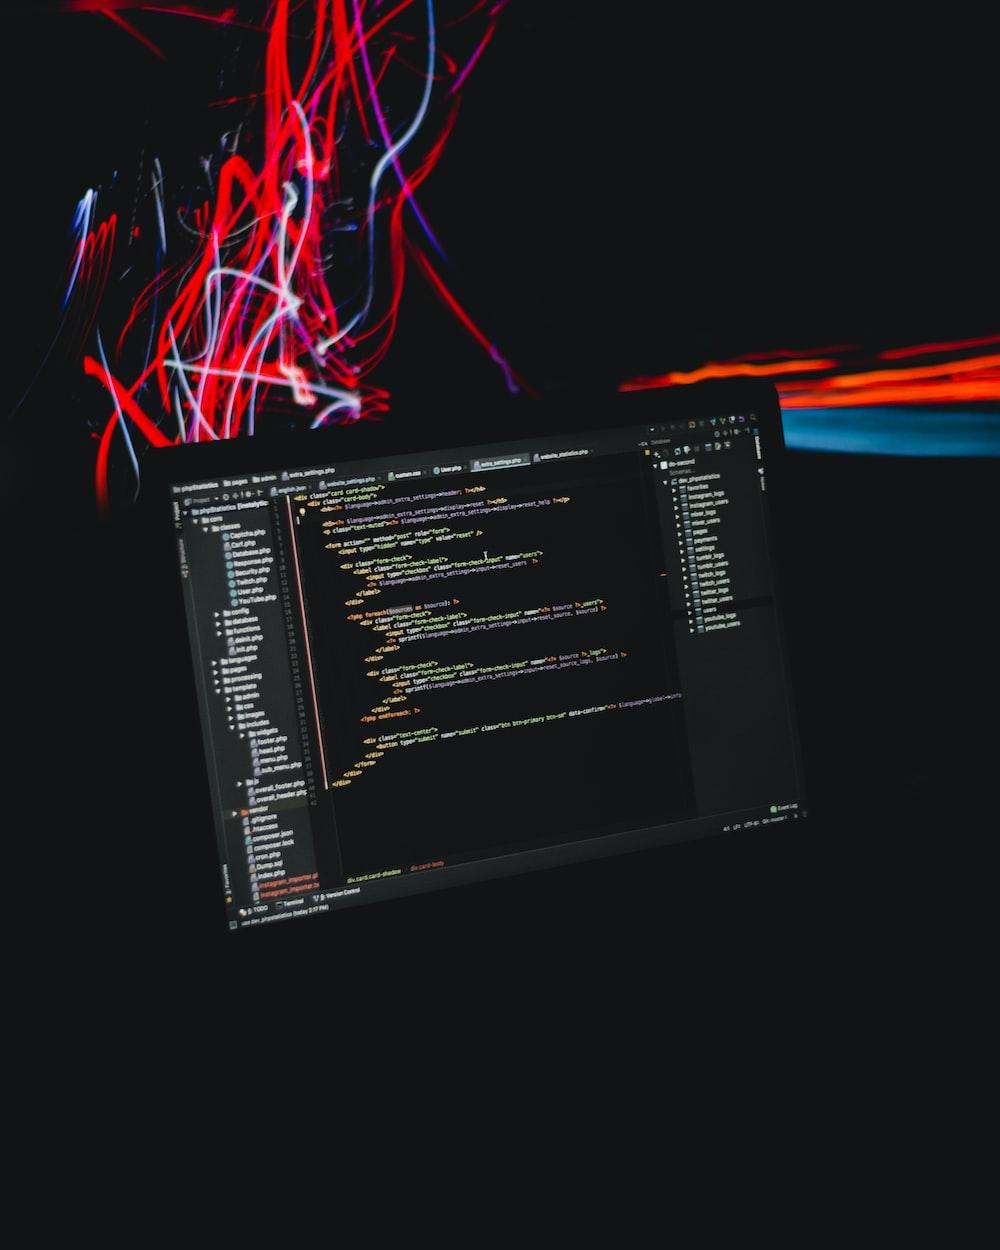 programming wallpaper 4k kopermimarlik